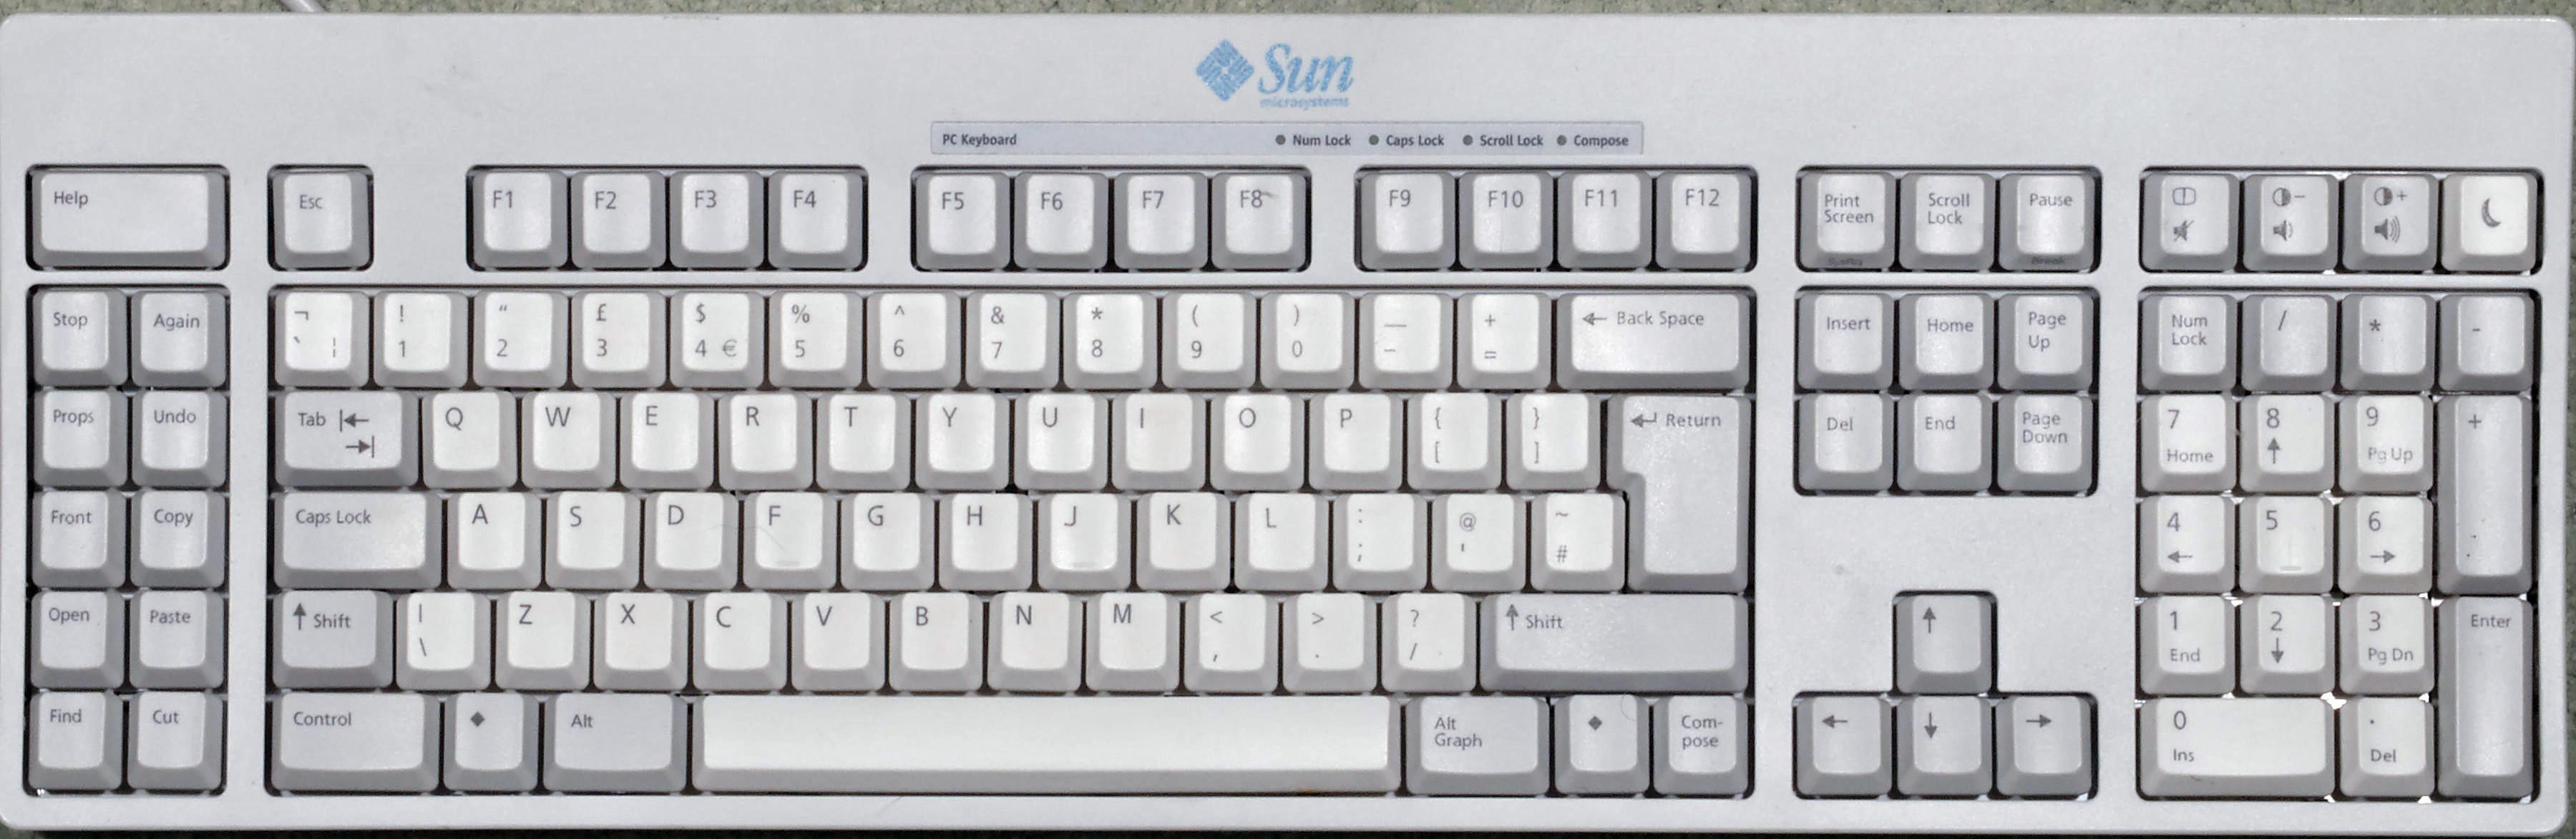 Keyboard-2.jpeg